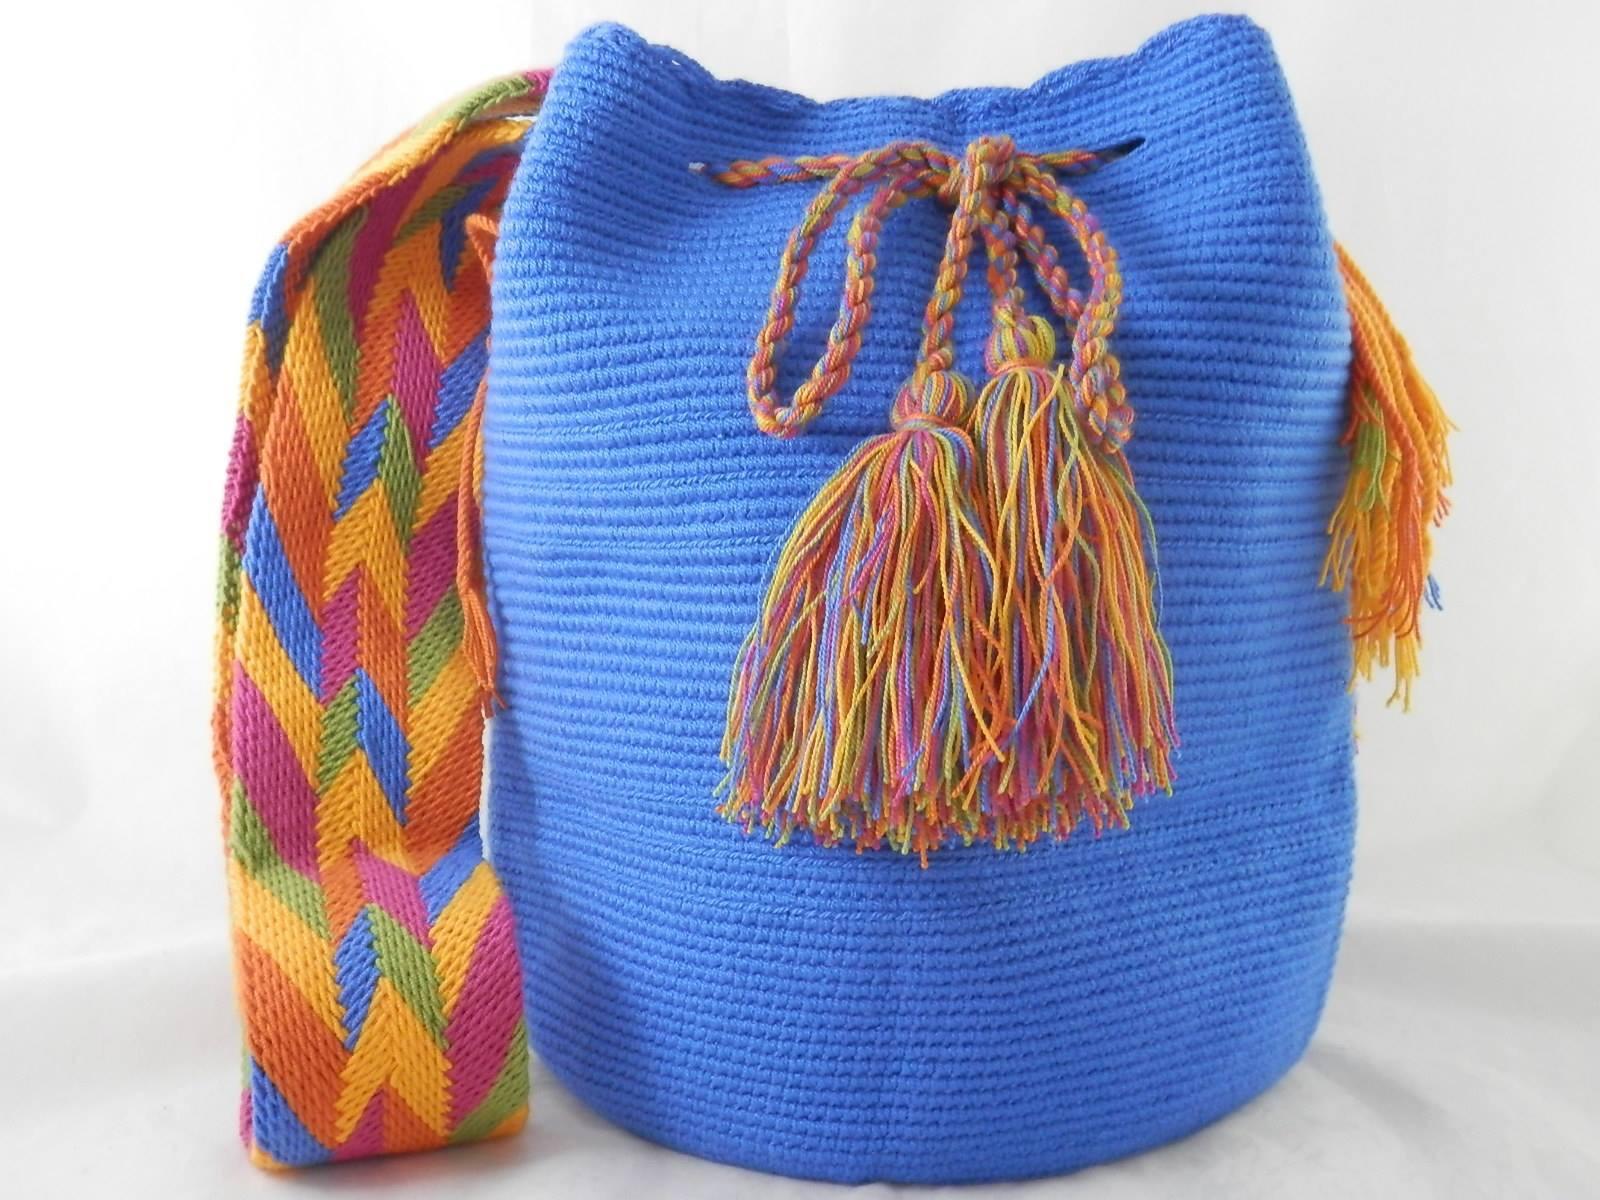 Wayuu Bag by PPS-9167